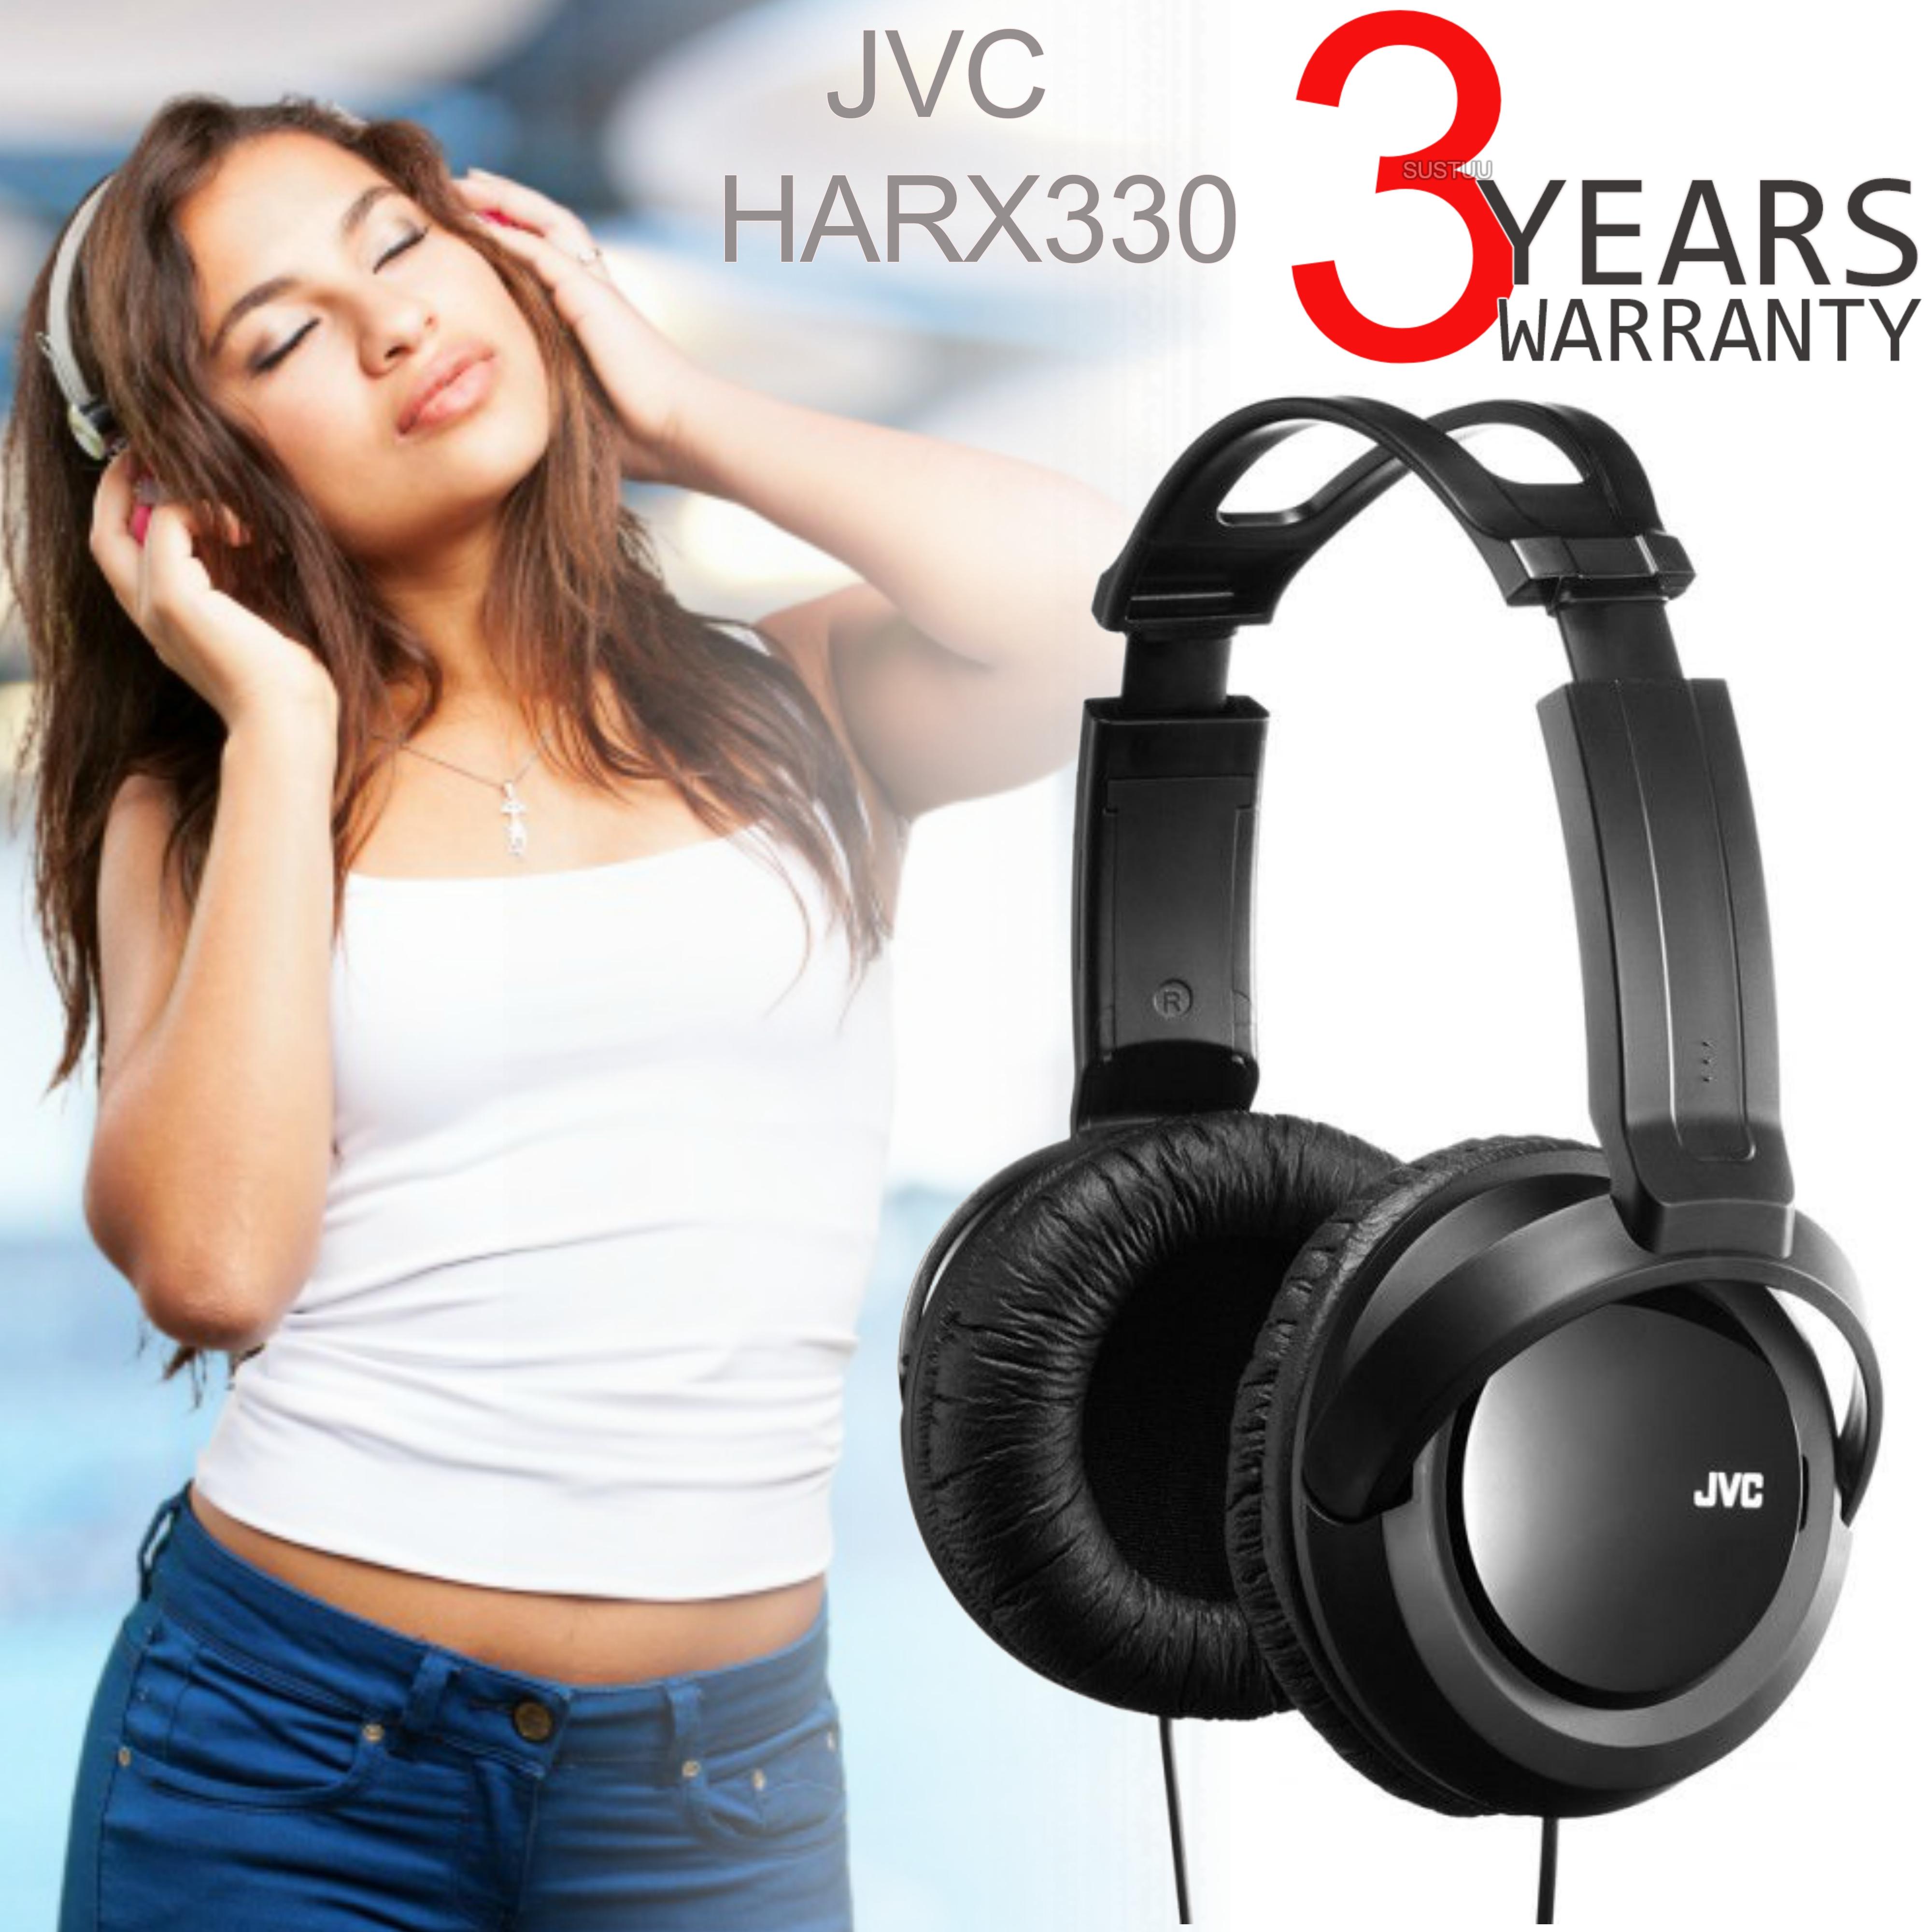 JVC HARX330 | Full-Size Over-Ear DJ Stereo Headphone | Deep Bass Sound | 2.5m Cord | Black